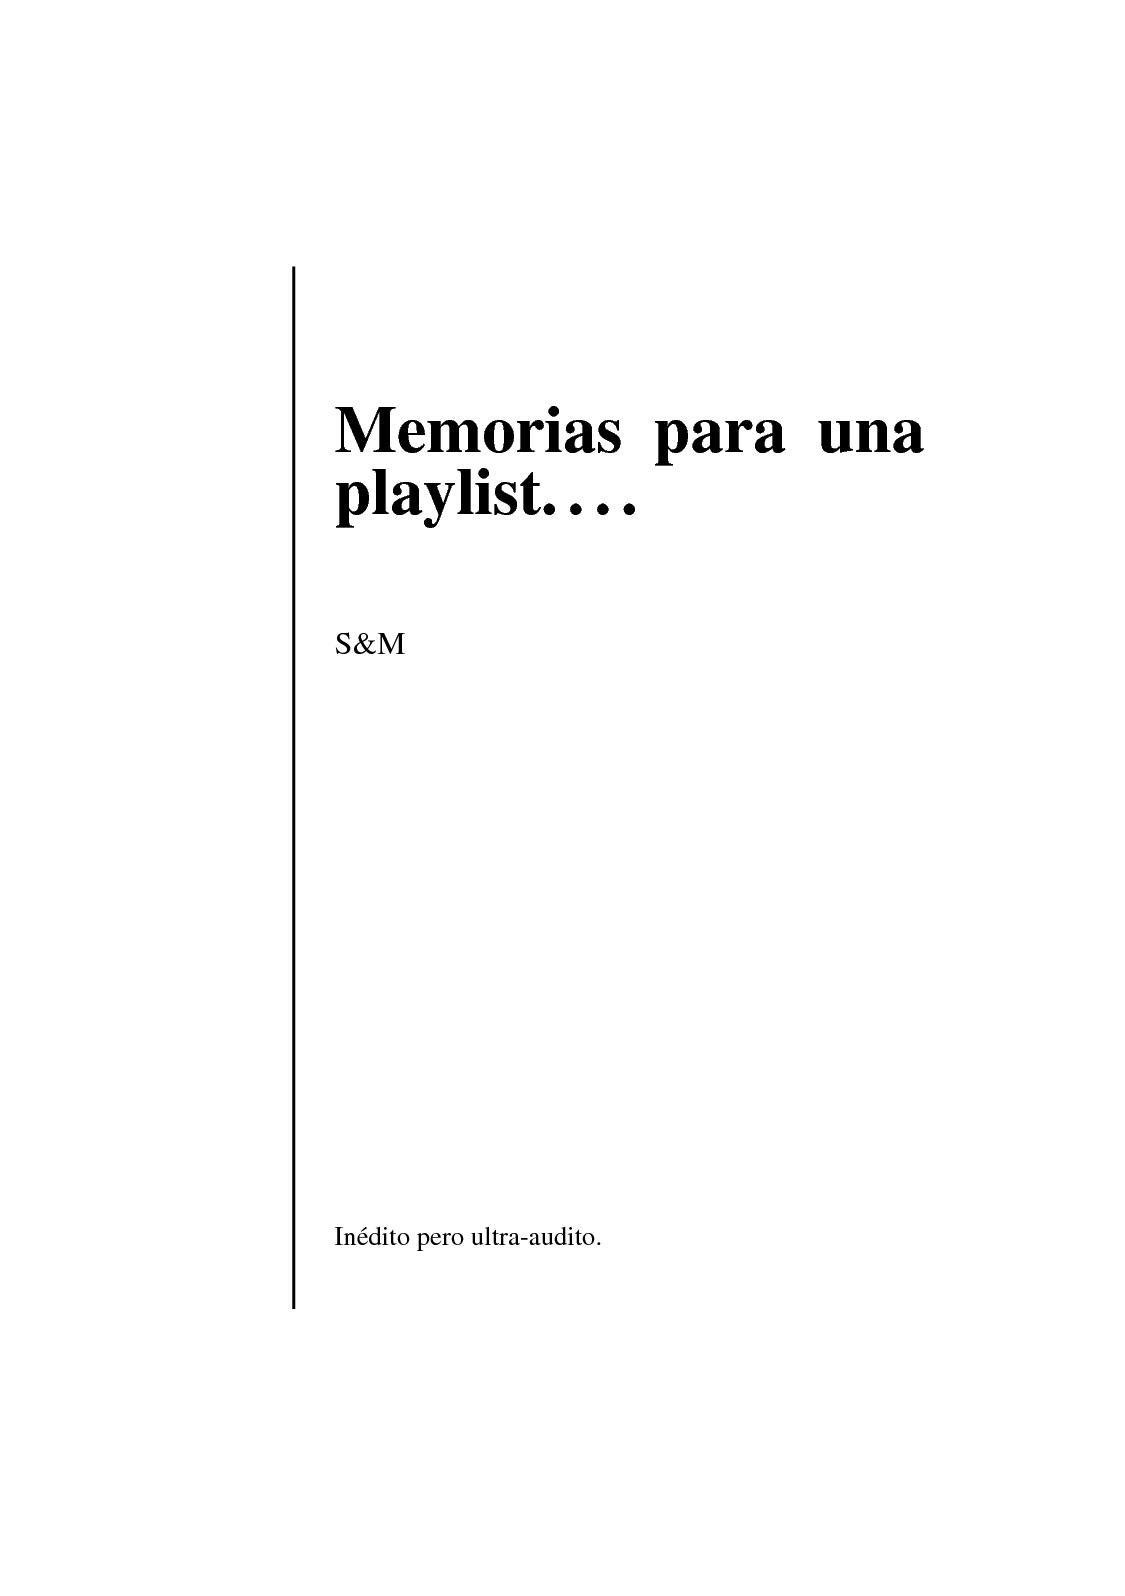 Calaméo - Memorias de una playlist